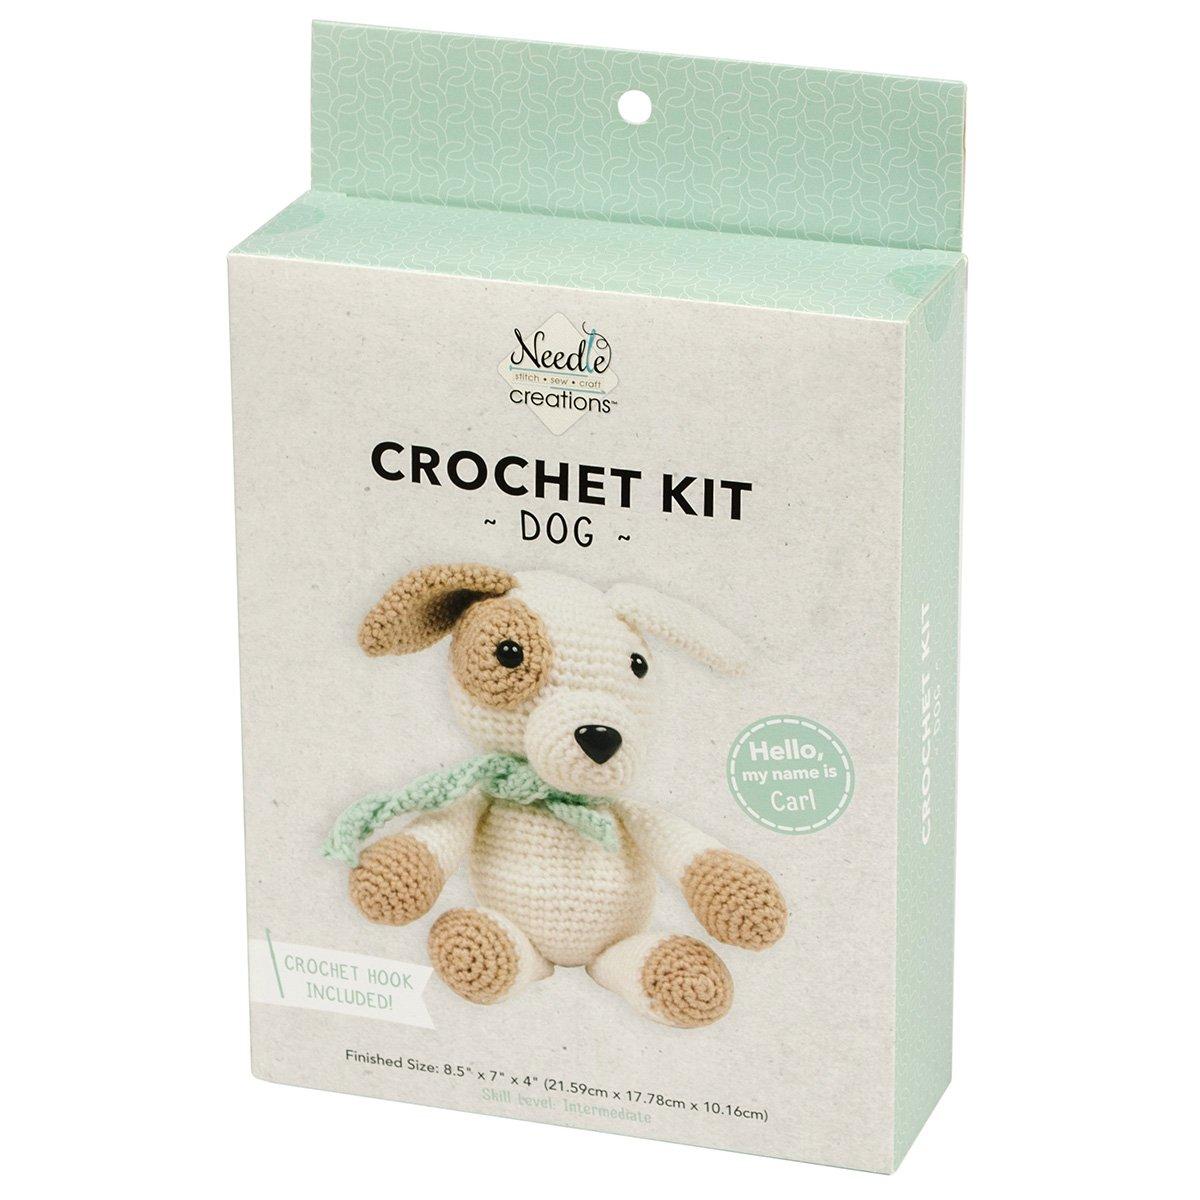 Needle Creations<br>3-D Crochet Kit Dog<br>NC-CRCHKT-DOG